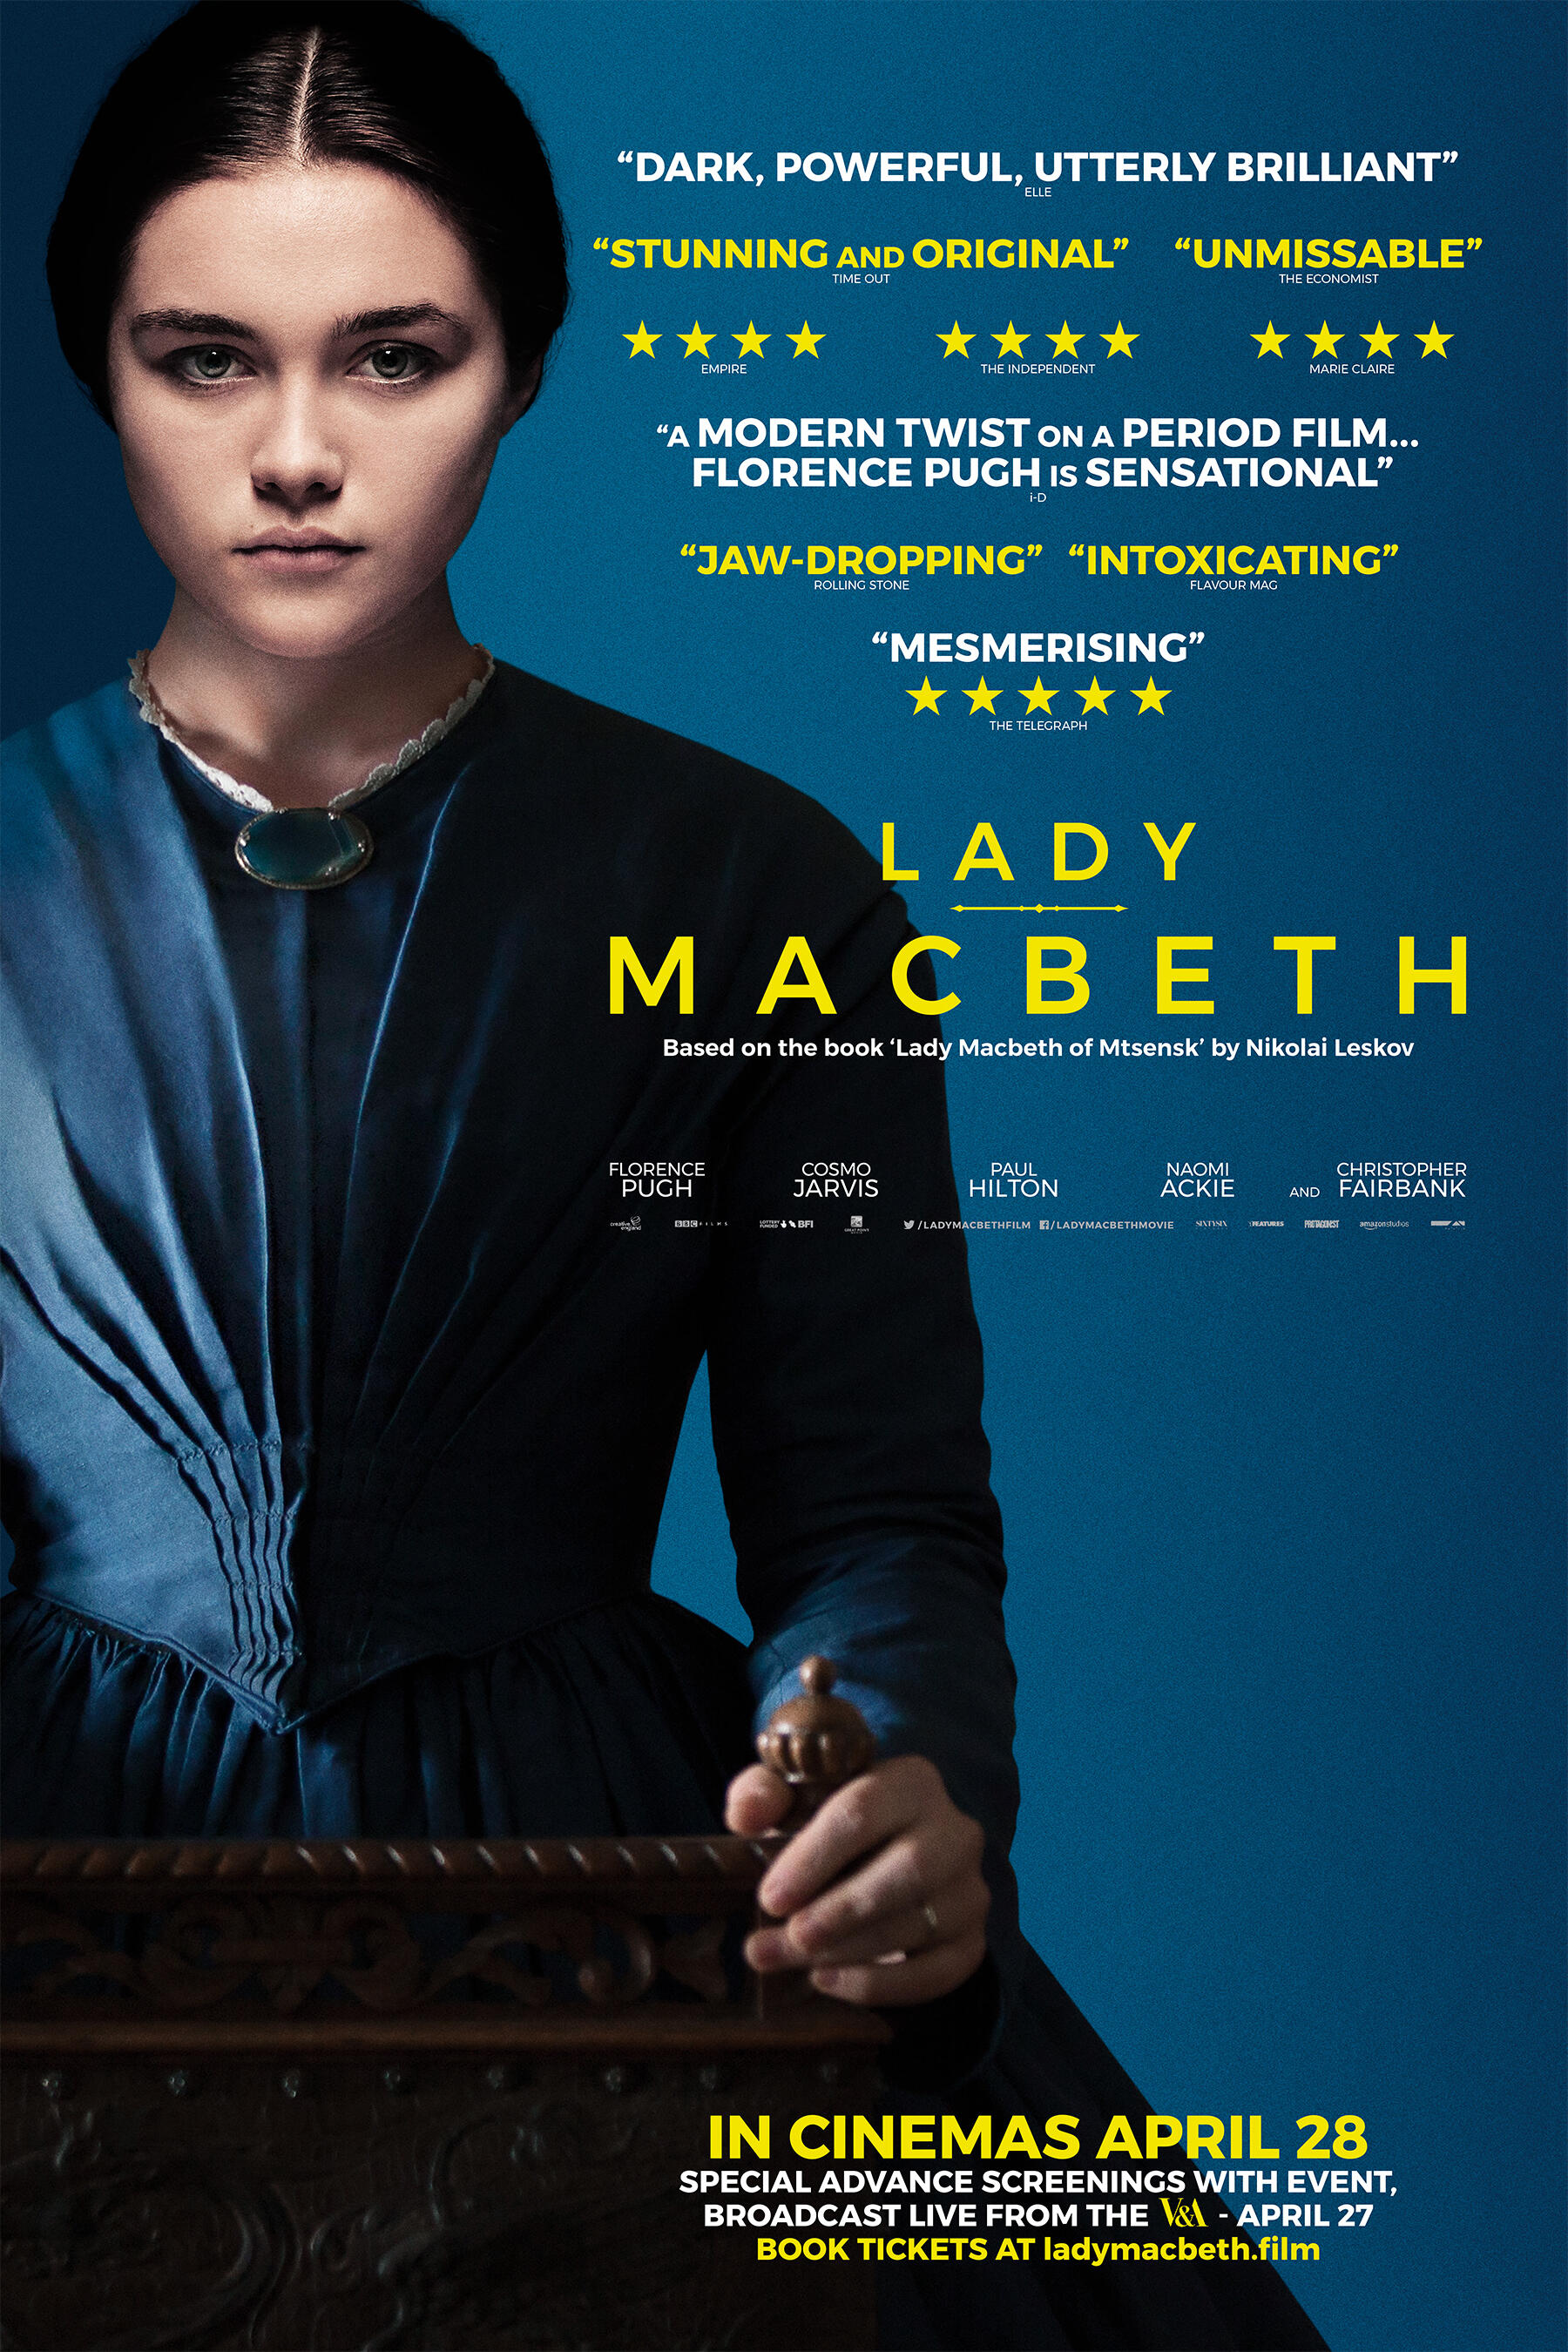 macbeth 16 With mauro hantman as macbeth and rachael warren as lady macbeth  8 9 10 11 12 13 14 15 16 17 18 19 20 21 22 23 24 25 26 27 28 29 30 31 .